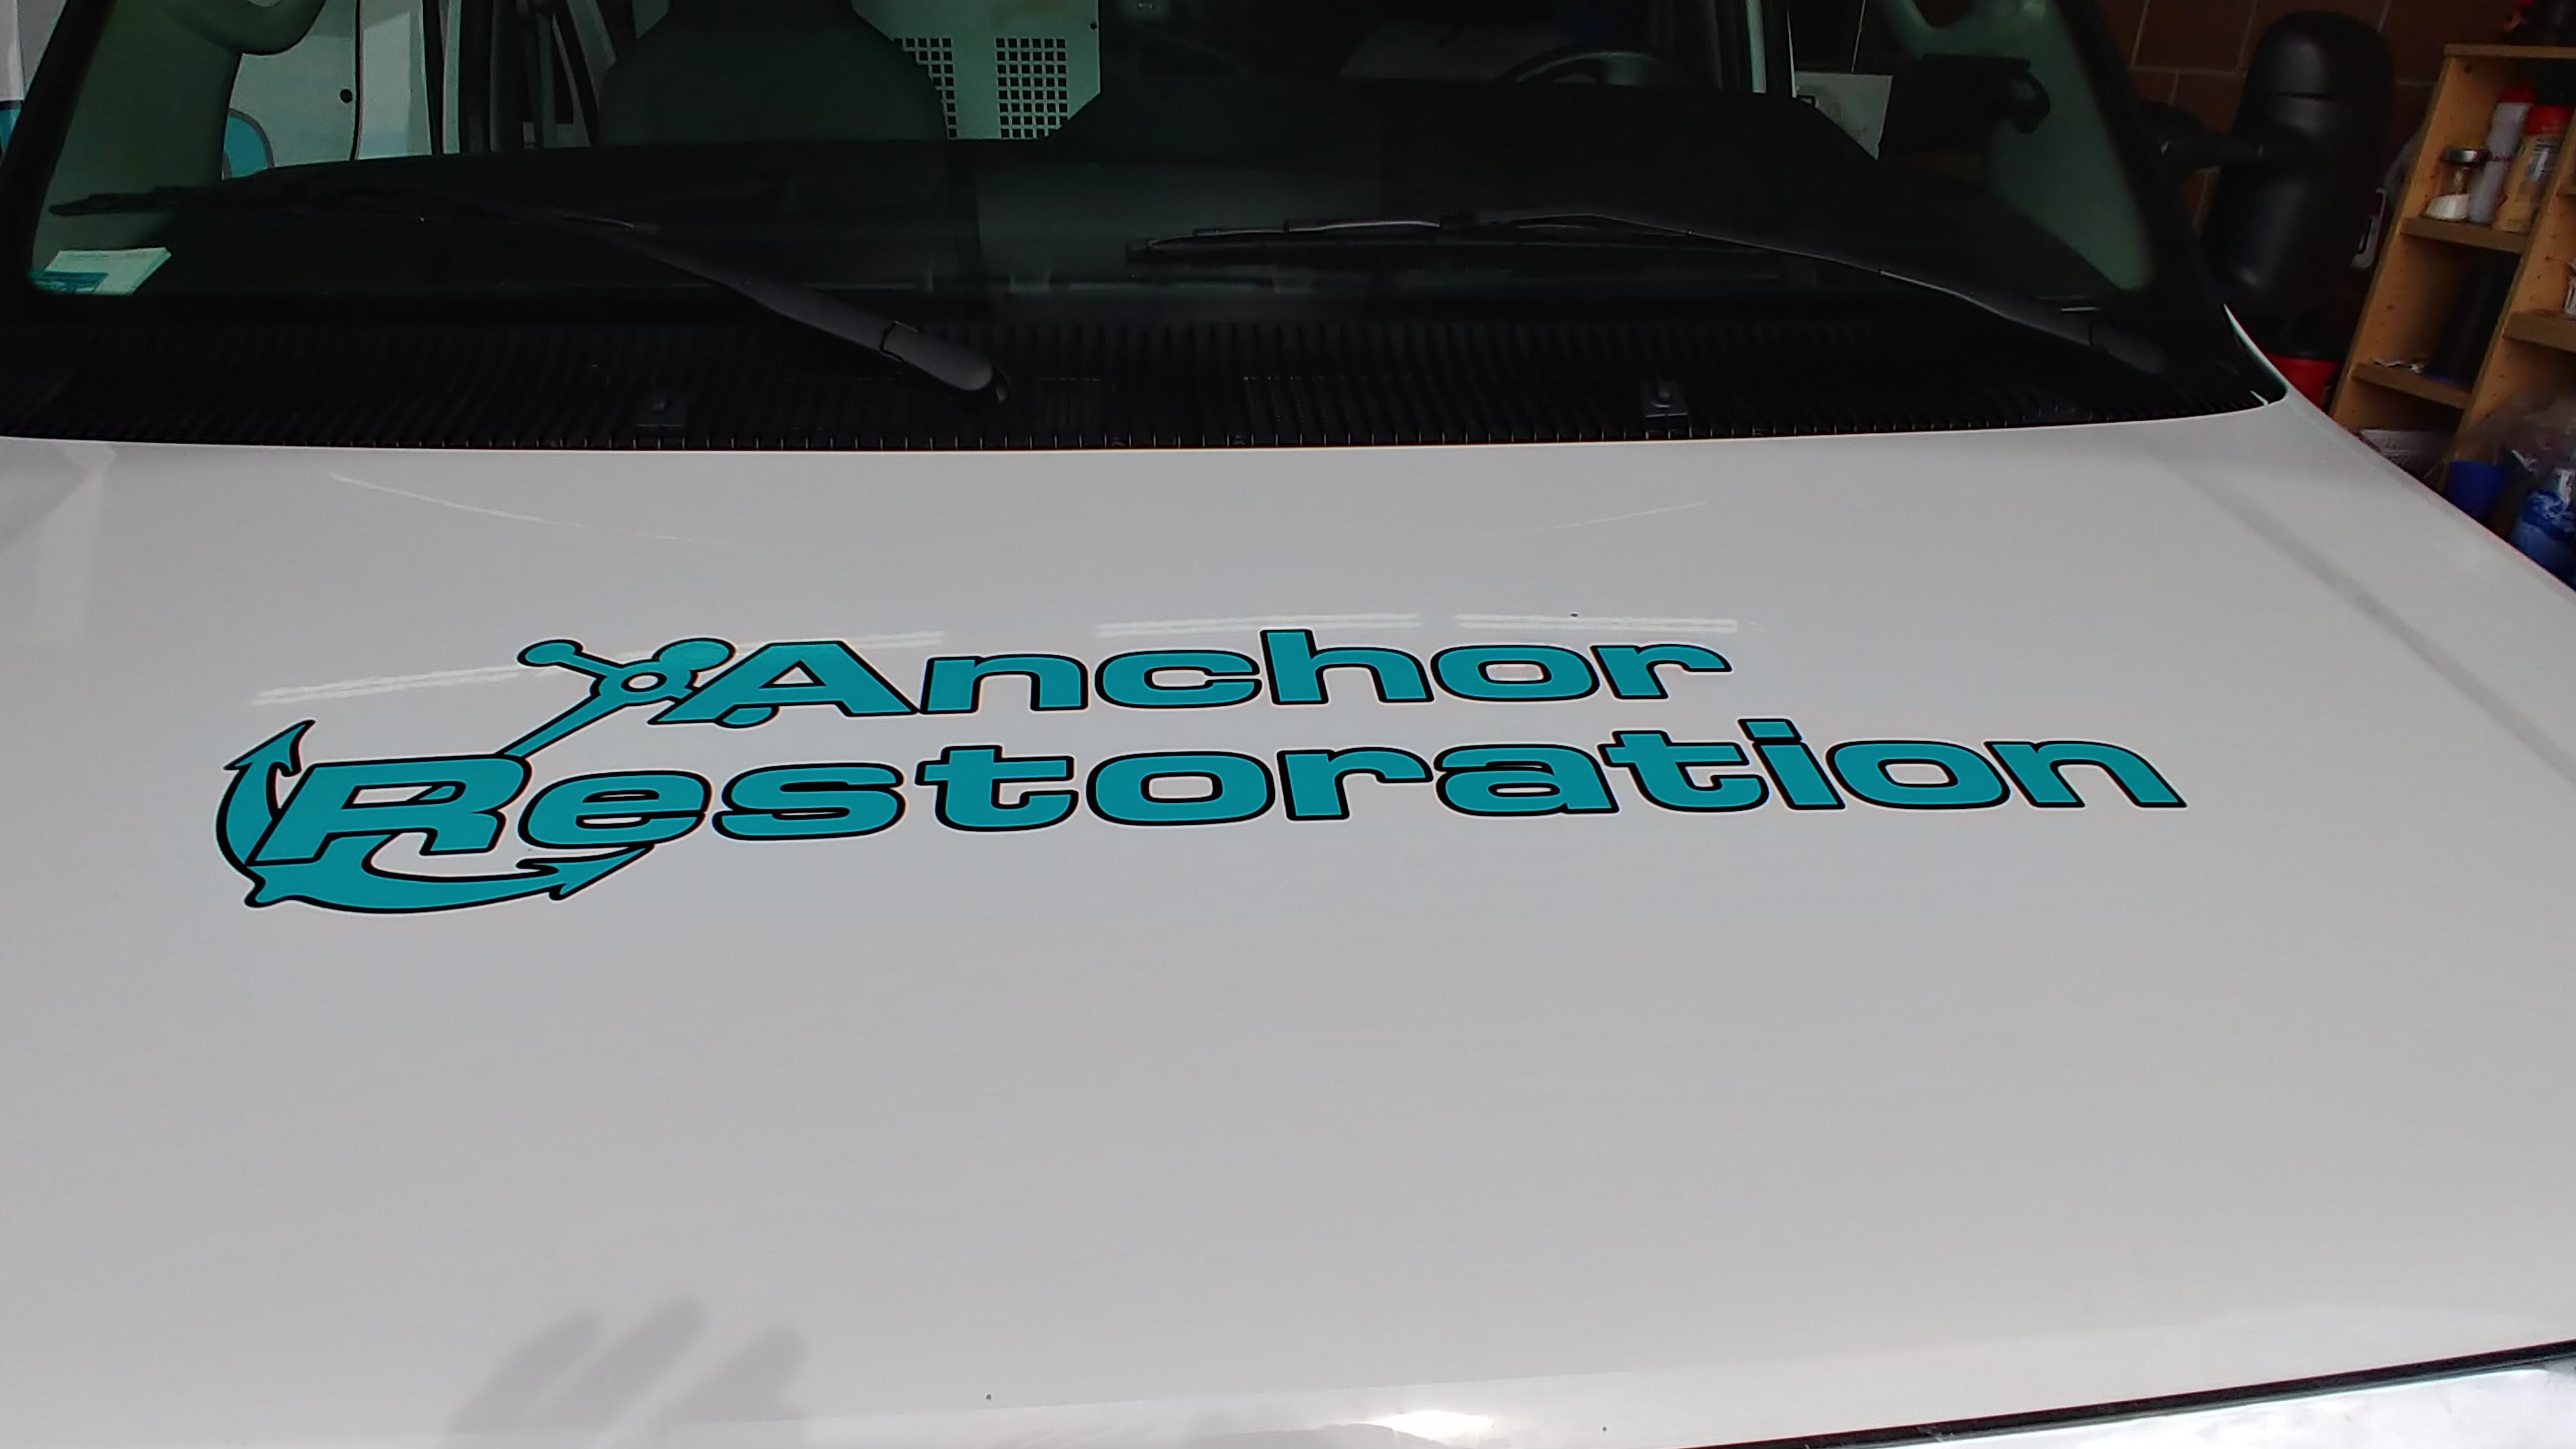 anchor restoration draper van